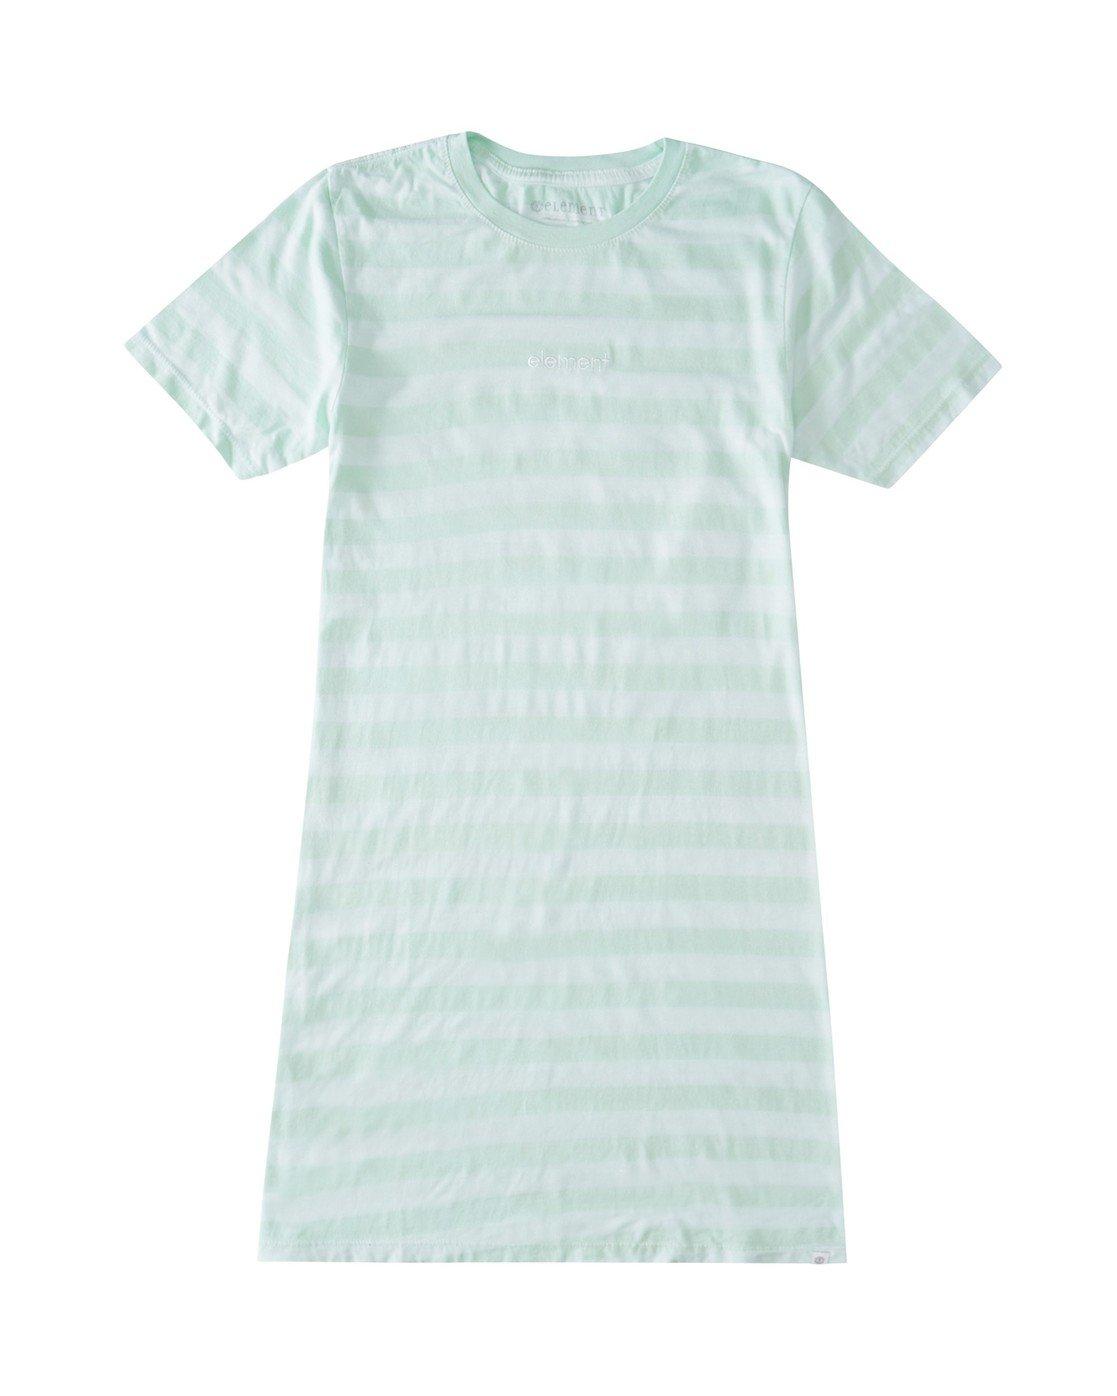 0 Mojo T-Shirt Dress Green JD432EMO Element